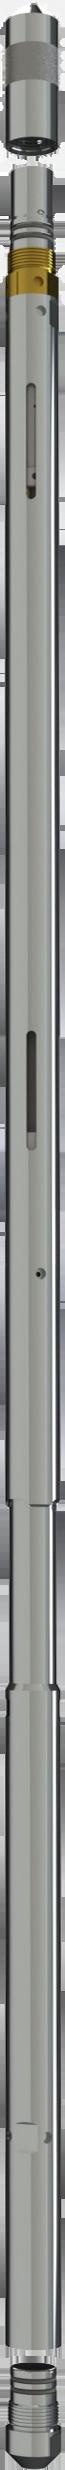 Gradiomanometer (Gradio)